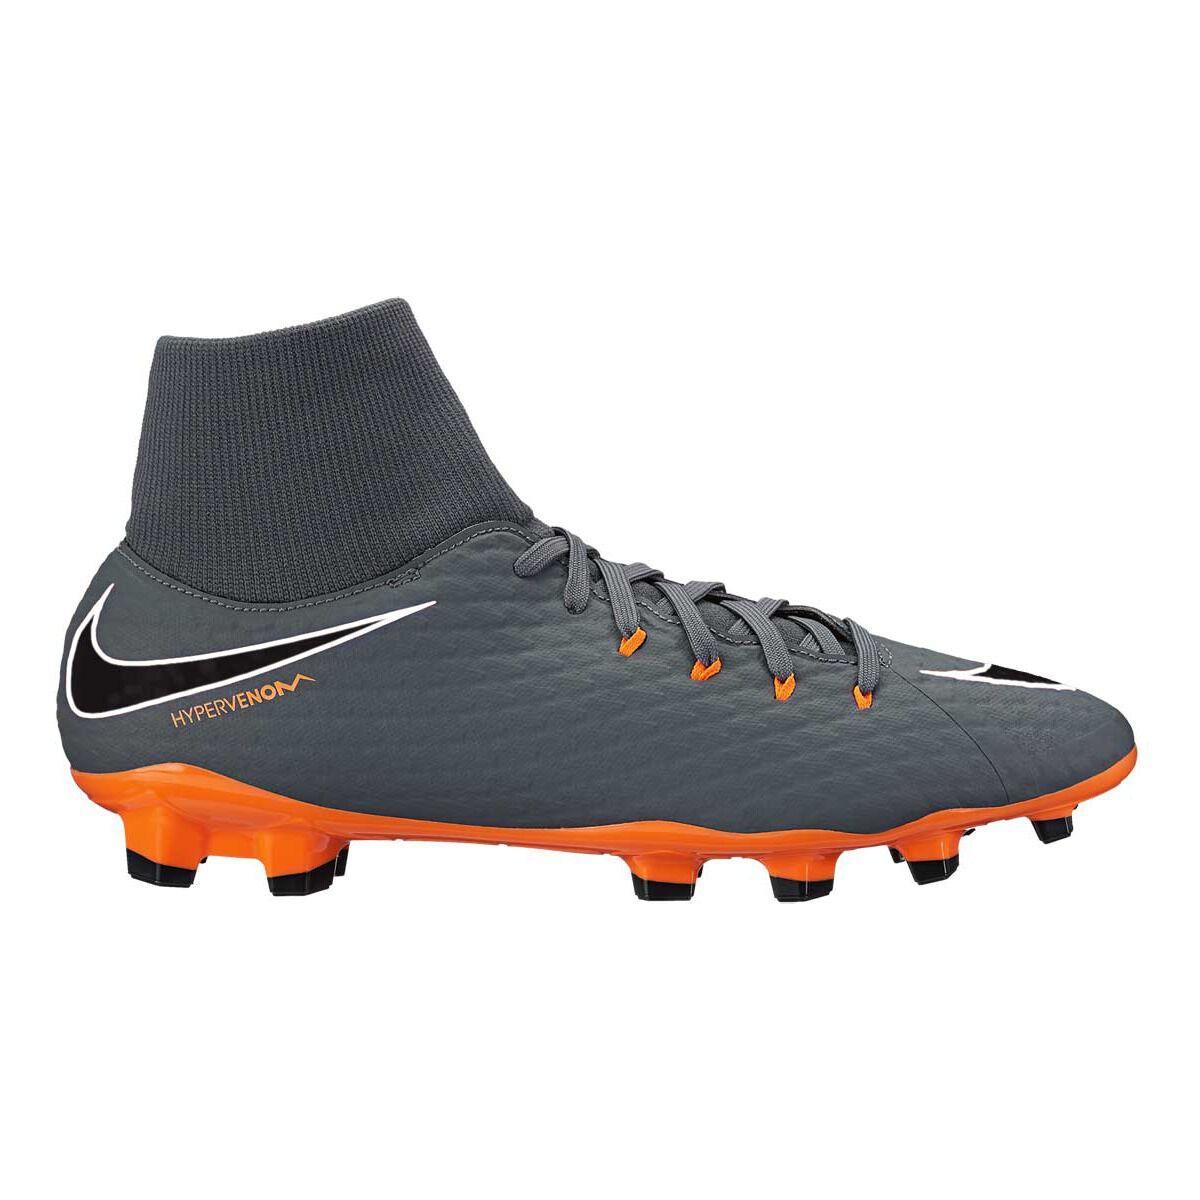 new concept f0316 9bed6 ... new zealand nike hypervenom phantom iii academy dynamic fit mens  football boots grey orange us 7